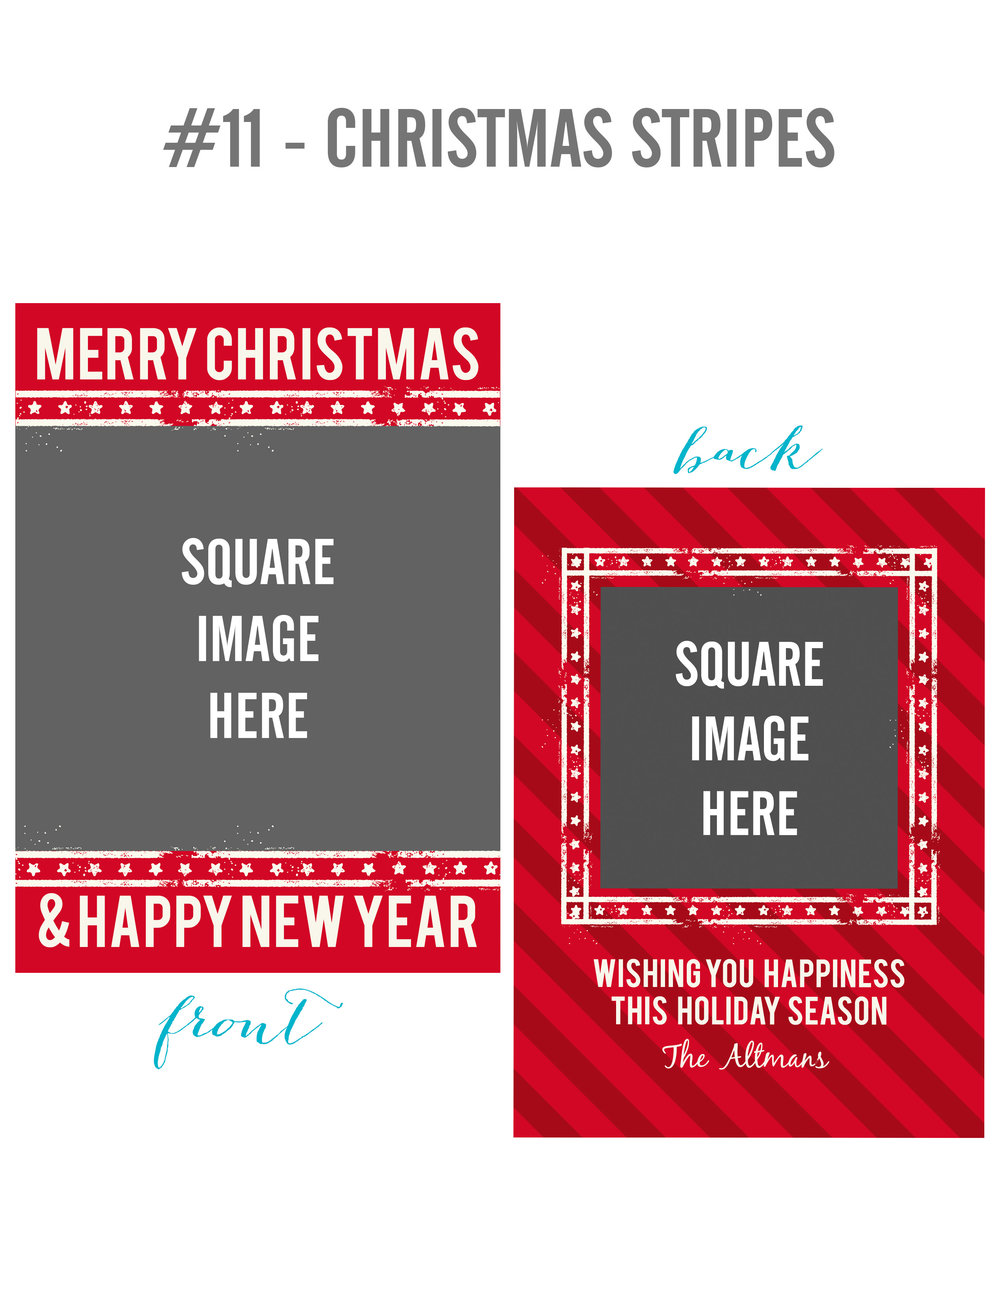 11-CHRISTMAS STRIPES.jpg